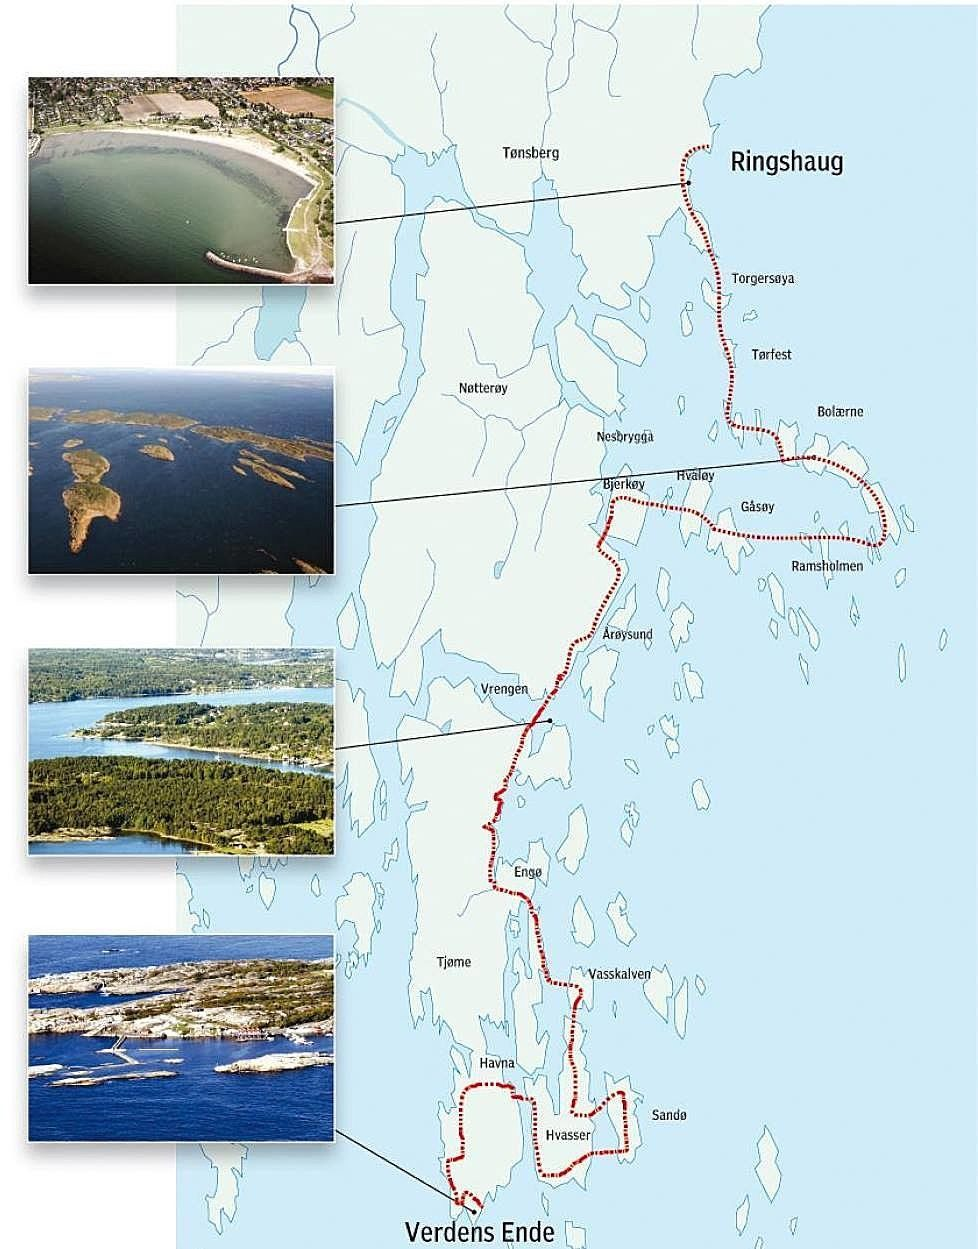 Route for Swimrun Norway